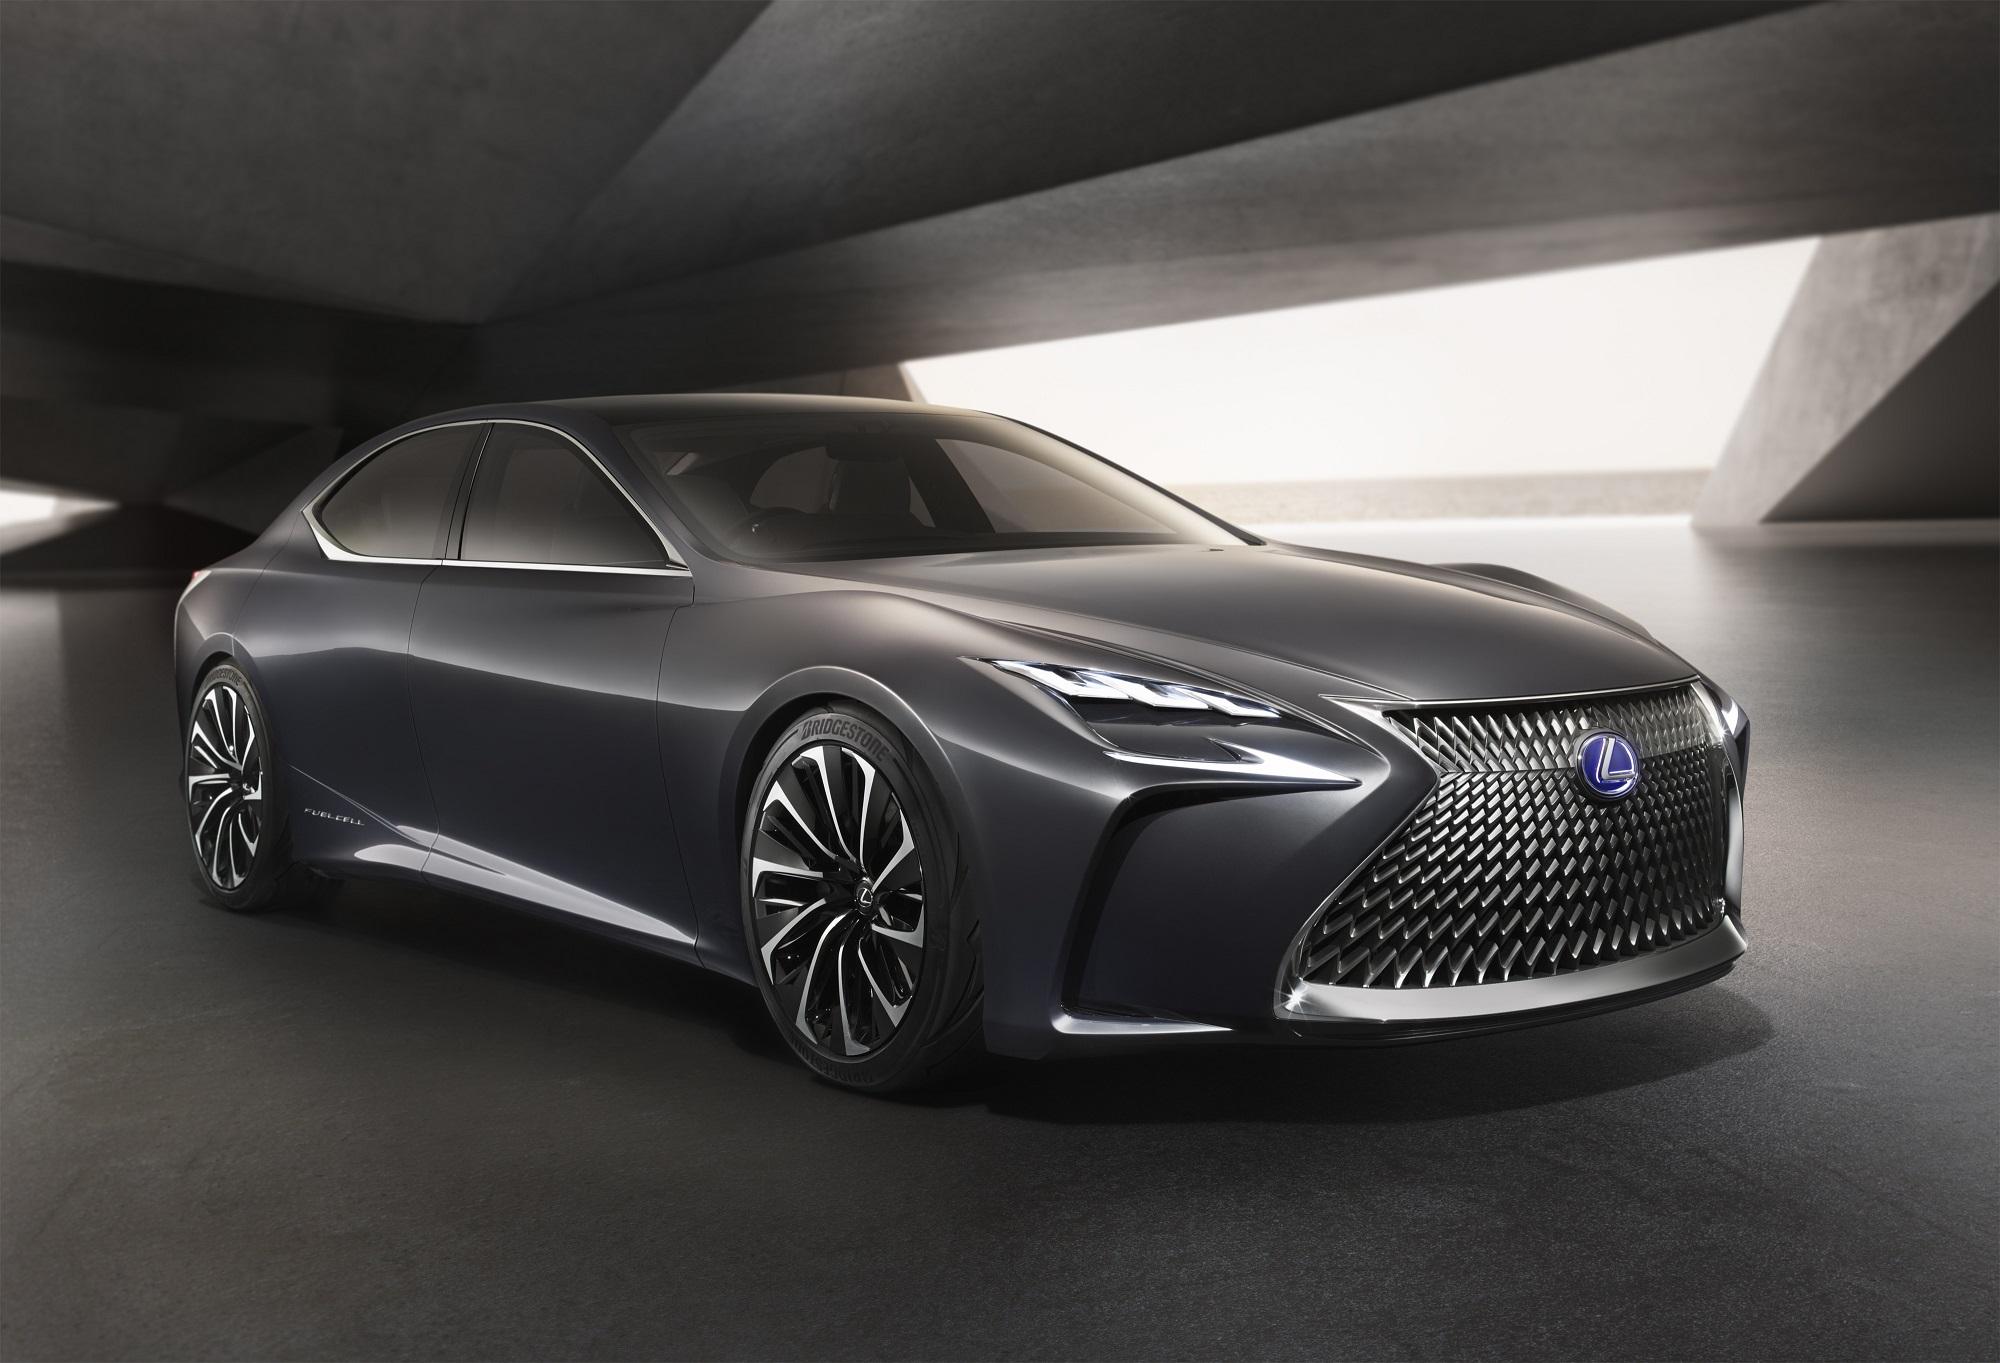 Latest Information: 2018 Lexus LS Flagship Sedan | YouWheel - Your Car ...